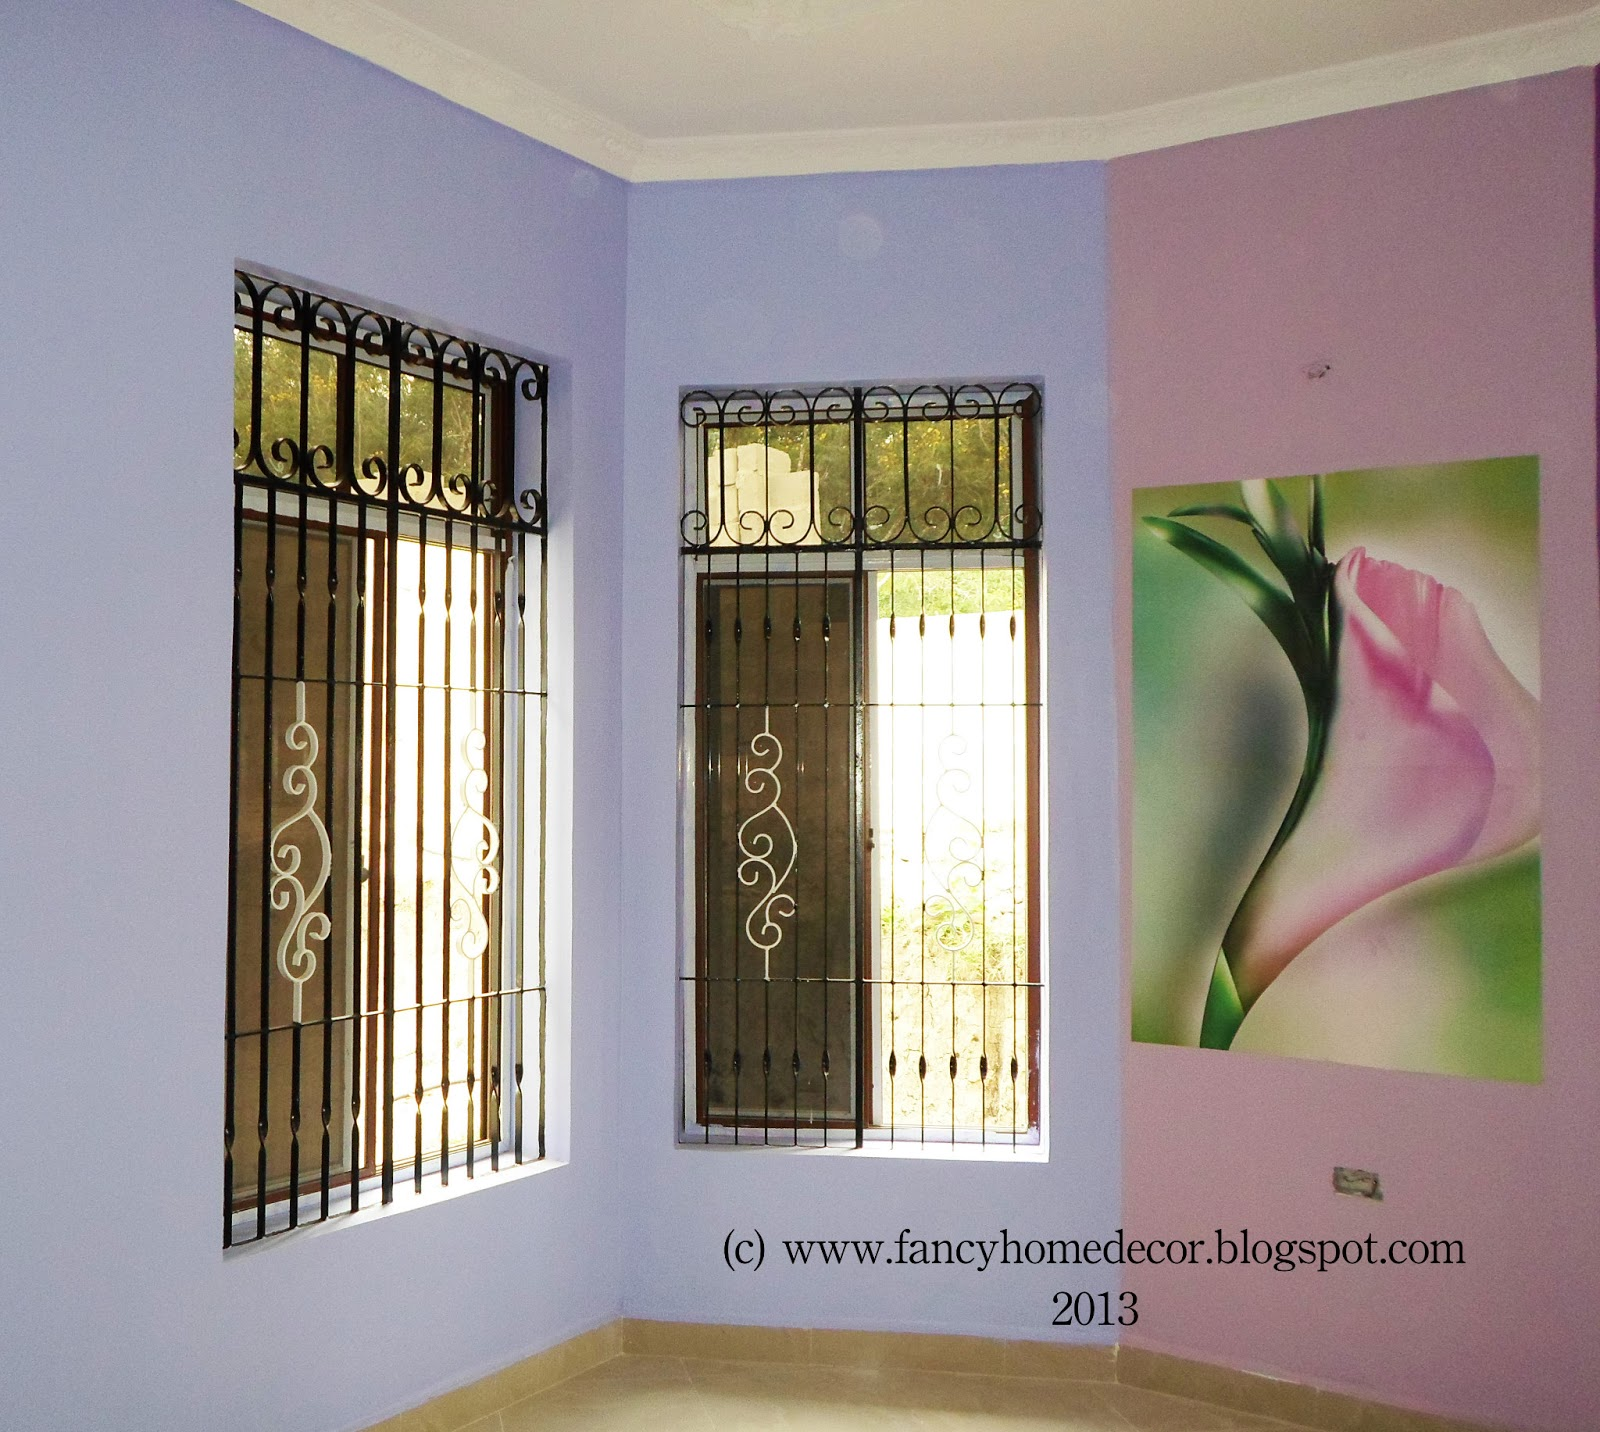 Best Home Decoration FANCY HOME DECOR PROJECT LIVING ROOM - Home decor pictures living room 2